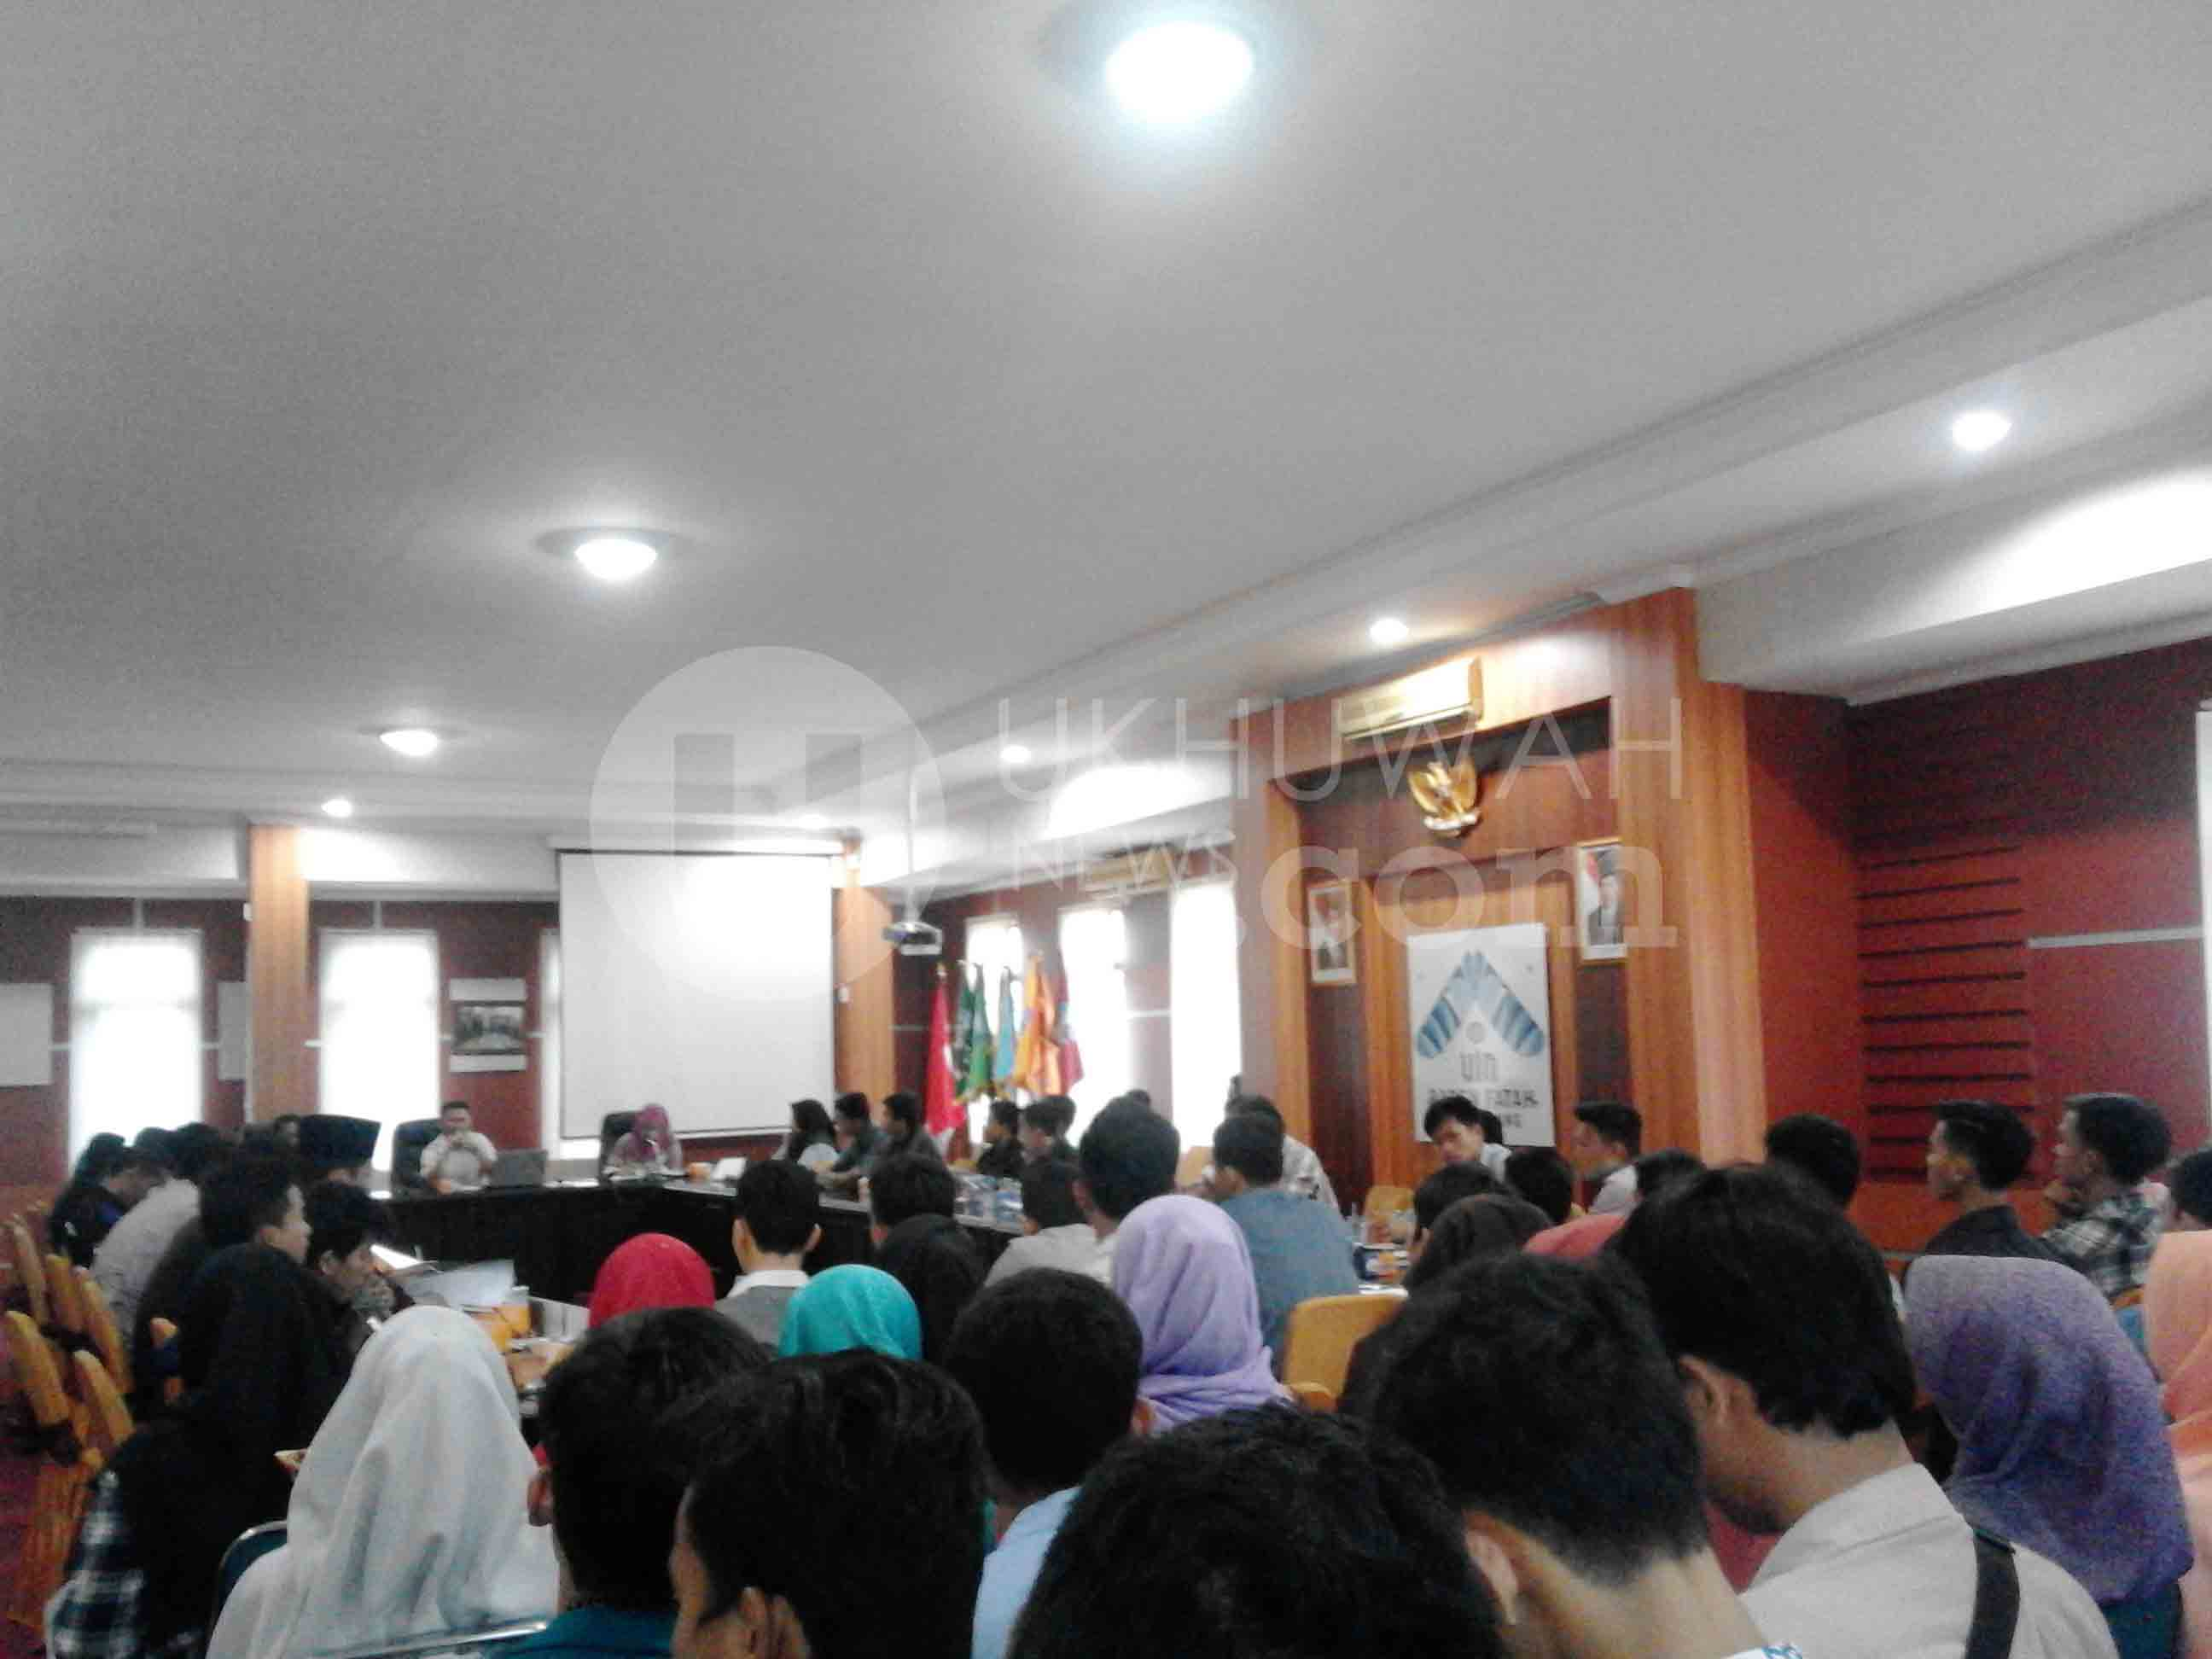 Sedang berlangsungnya diskusi antara Wakil Rektor III UIN RF, Rina Antasari dengan perwakilan mahasiswa dari seluruh Unit Kegiatan Mahasiswa Khusus (UKMK) serta pengurus Dema dan Sema-U Tahun 2015 sebelumnya membahas draf Pedoman Komisi Pemilihan Umum Mahasiswa (KPUM) menjelang Pemilihan Mahasiswa Raya (Pemira) Tahun 2016, di Gedung Rektorat UIN RF, Selasa (8/11).